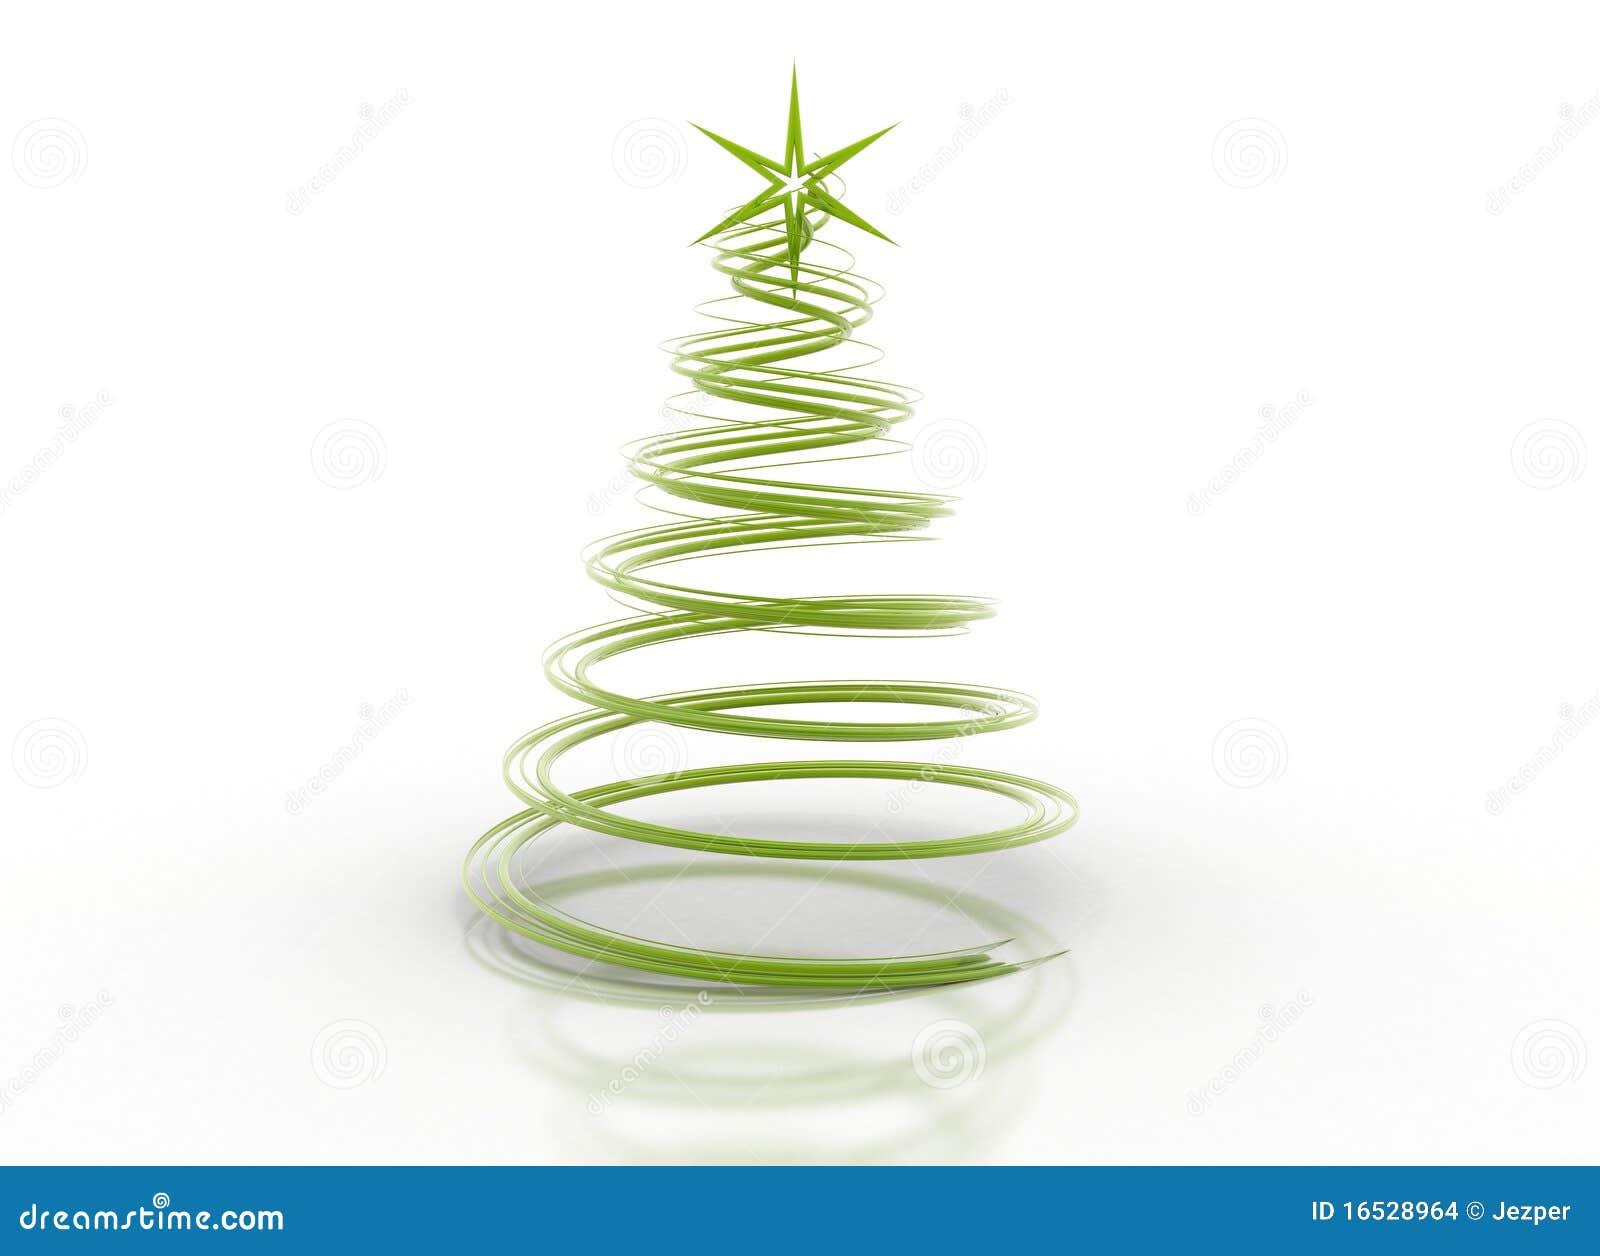 abstrakter gr ner spial weihnachtsbaum stock abbildung. Black Bedroom Furniture Sets. Home Design Ideas